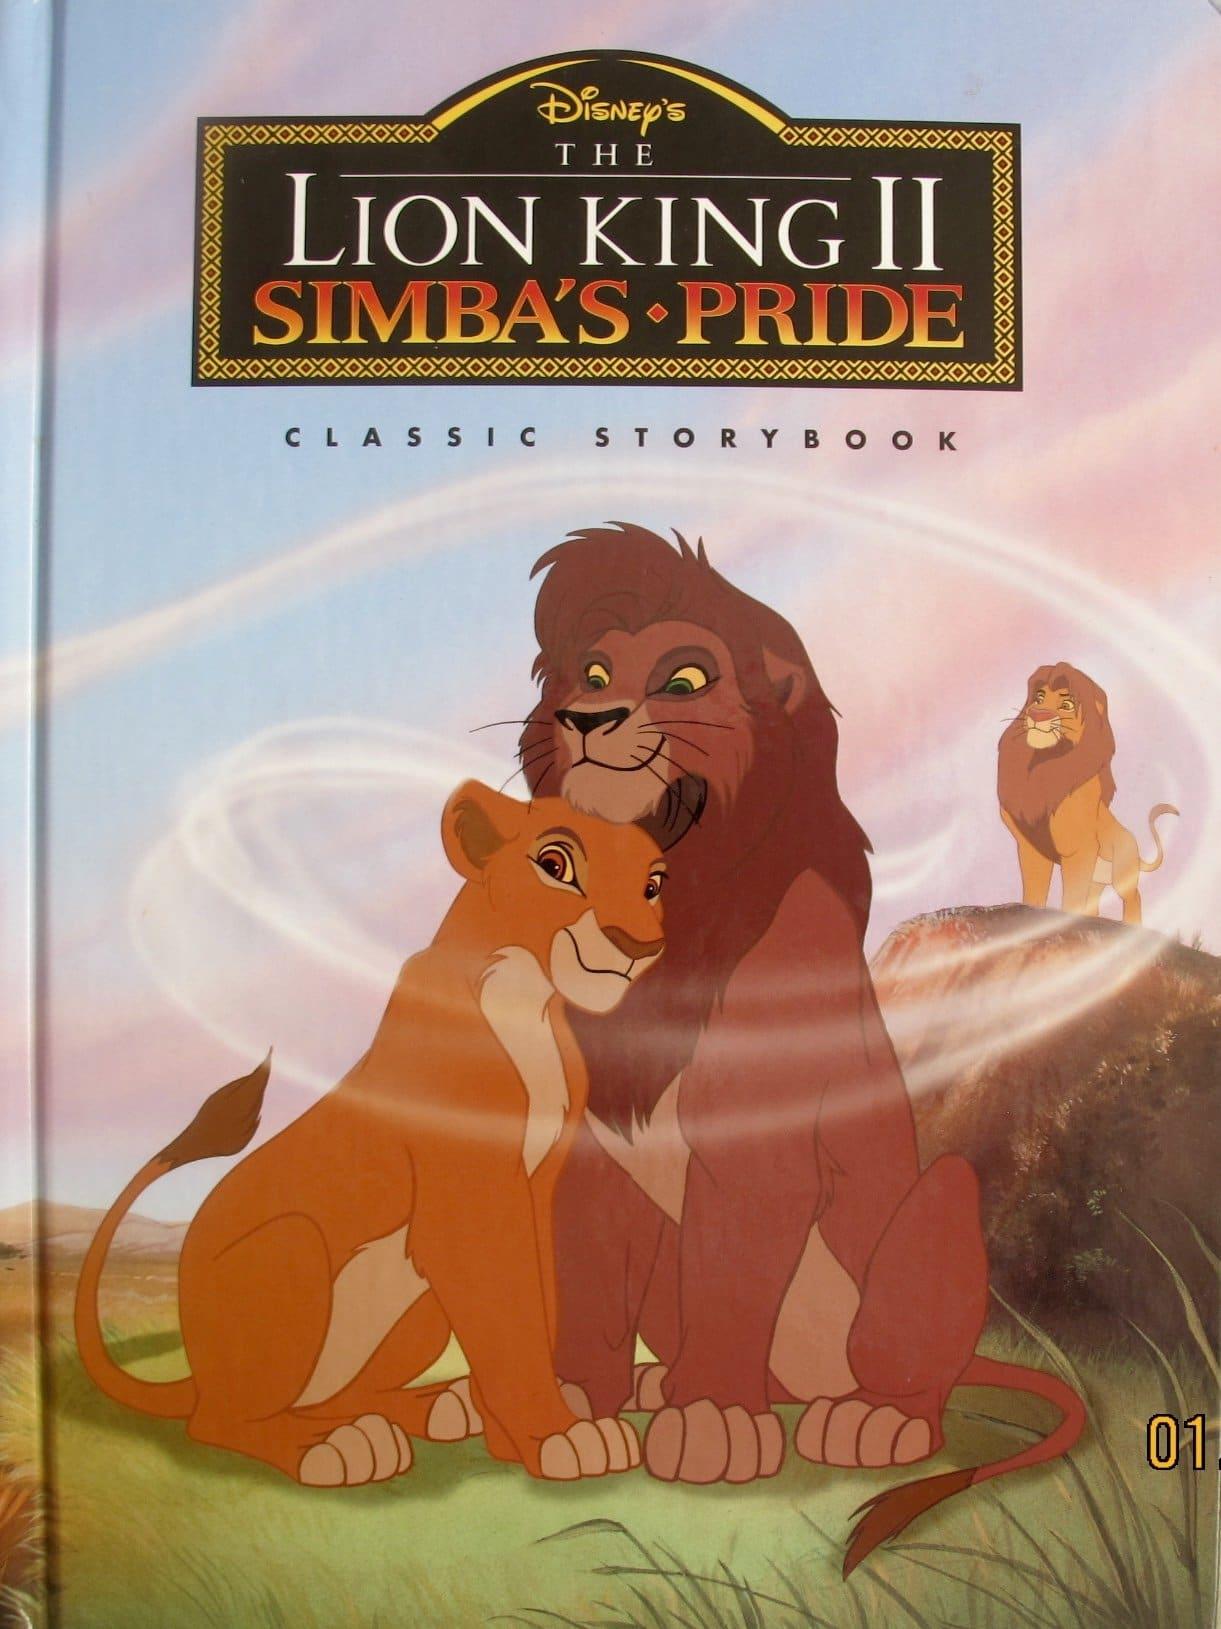 the lion king poster part 2 simbas pride 1998 high quality HD printable wallpapers kiara with kuvo